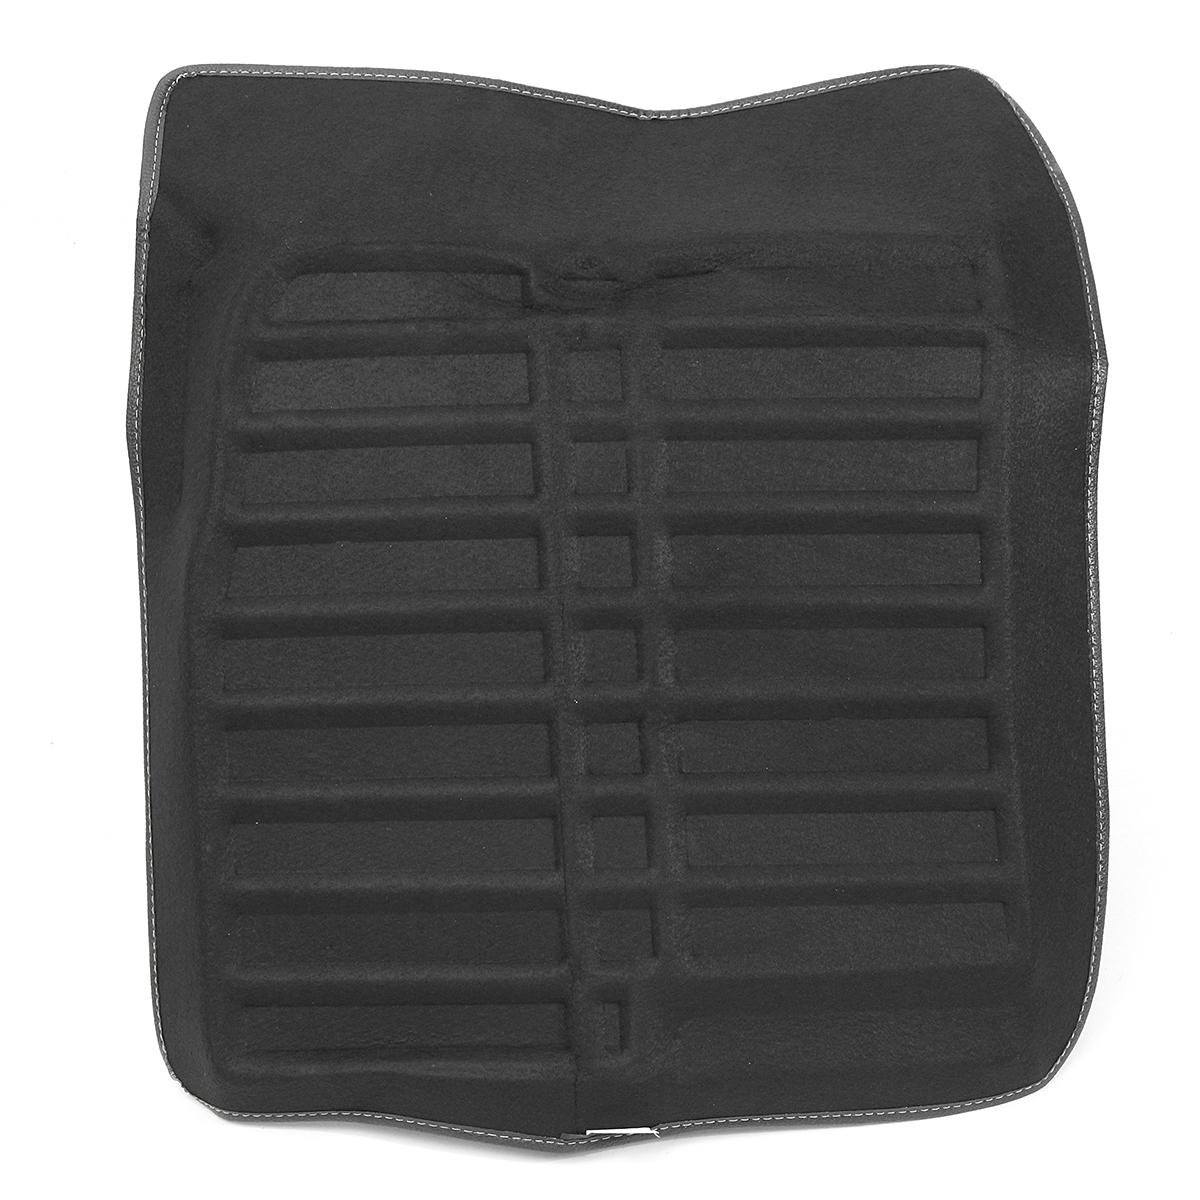 3Pcs PU Leather Full-Encased Car Floor Mat Front Rear Liner Waterproof for Kia Optima 2011-2016